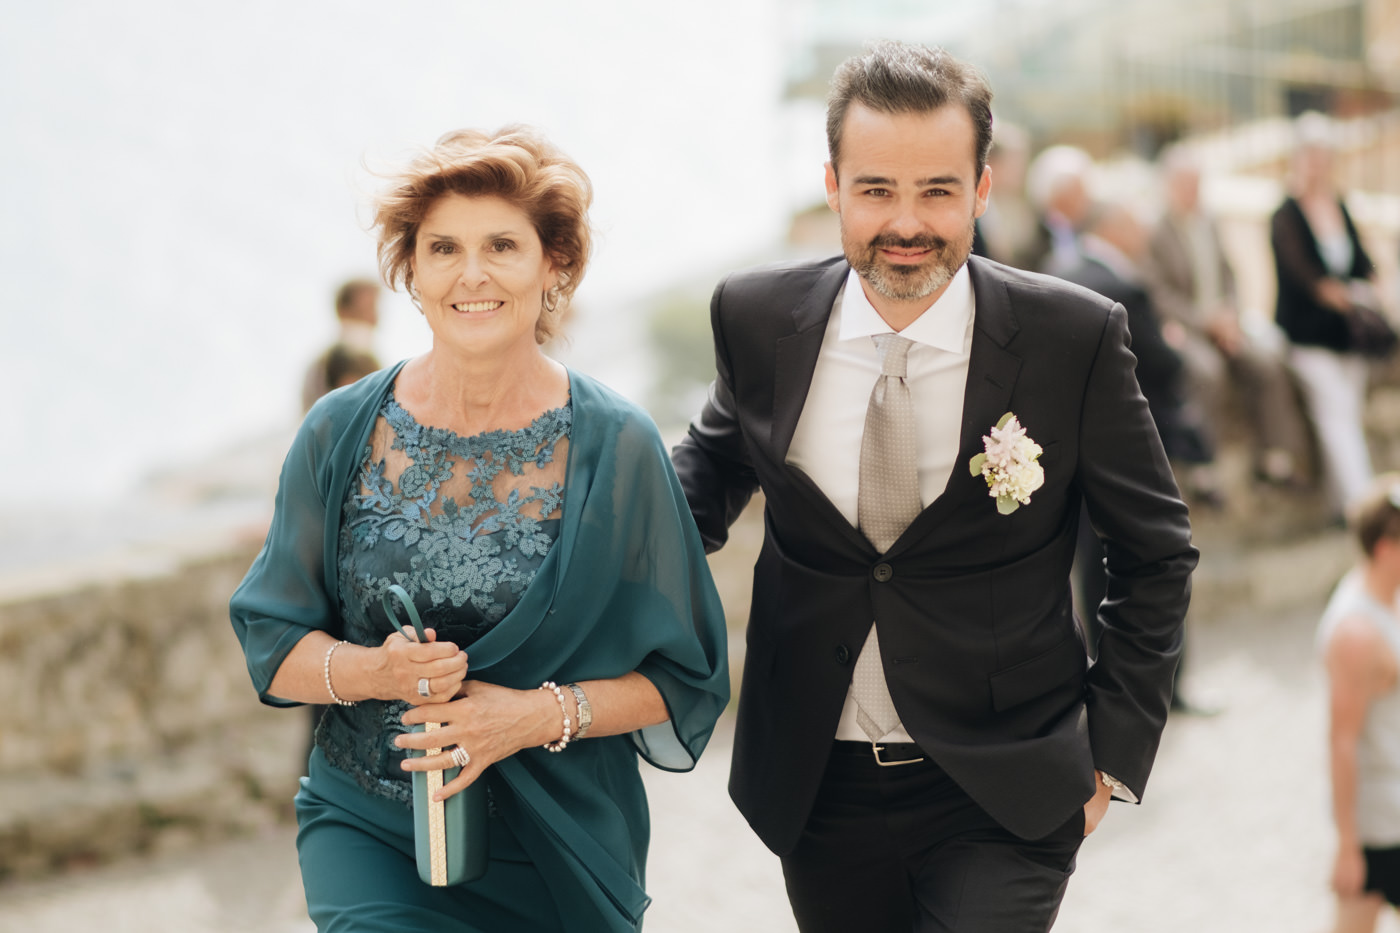 matrimoni_all_italiana_fotografo_matrimonio_cinque_terre-15.jpg